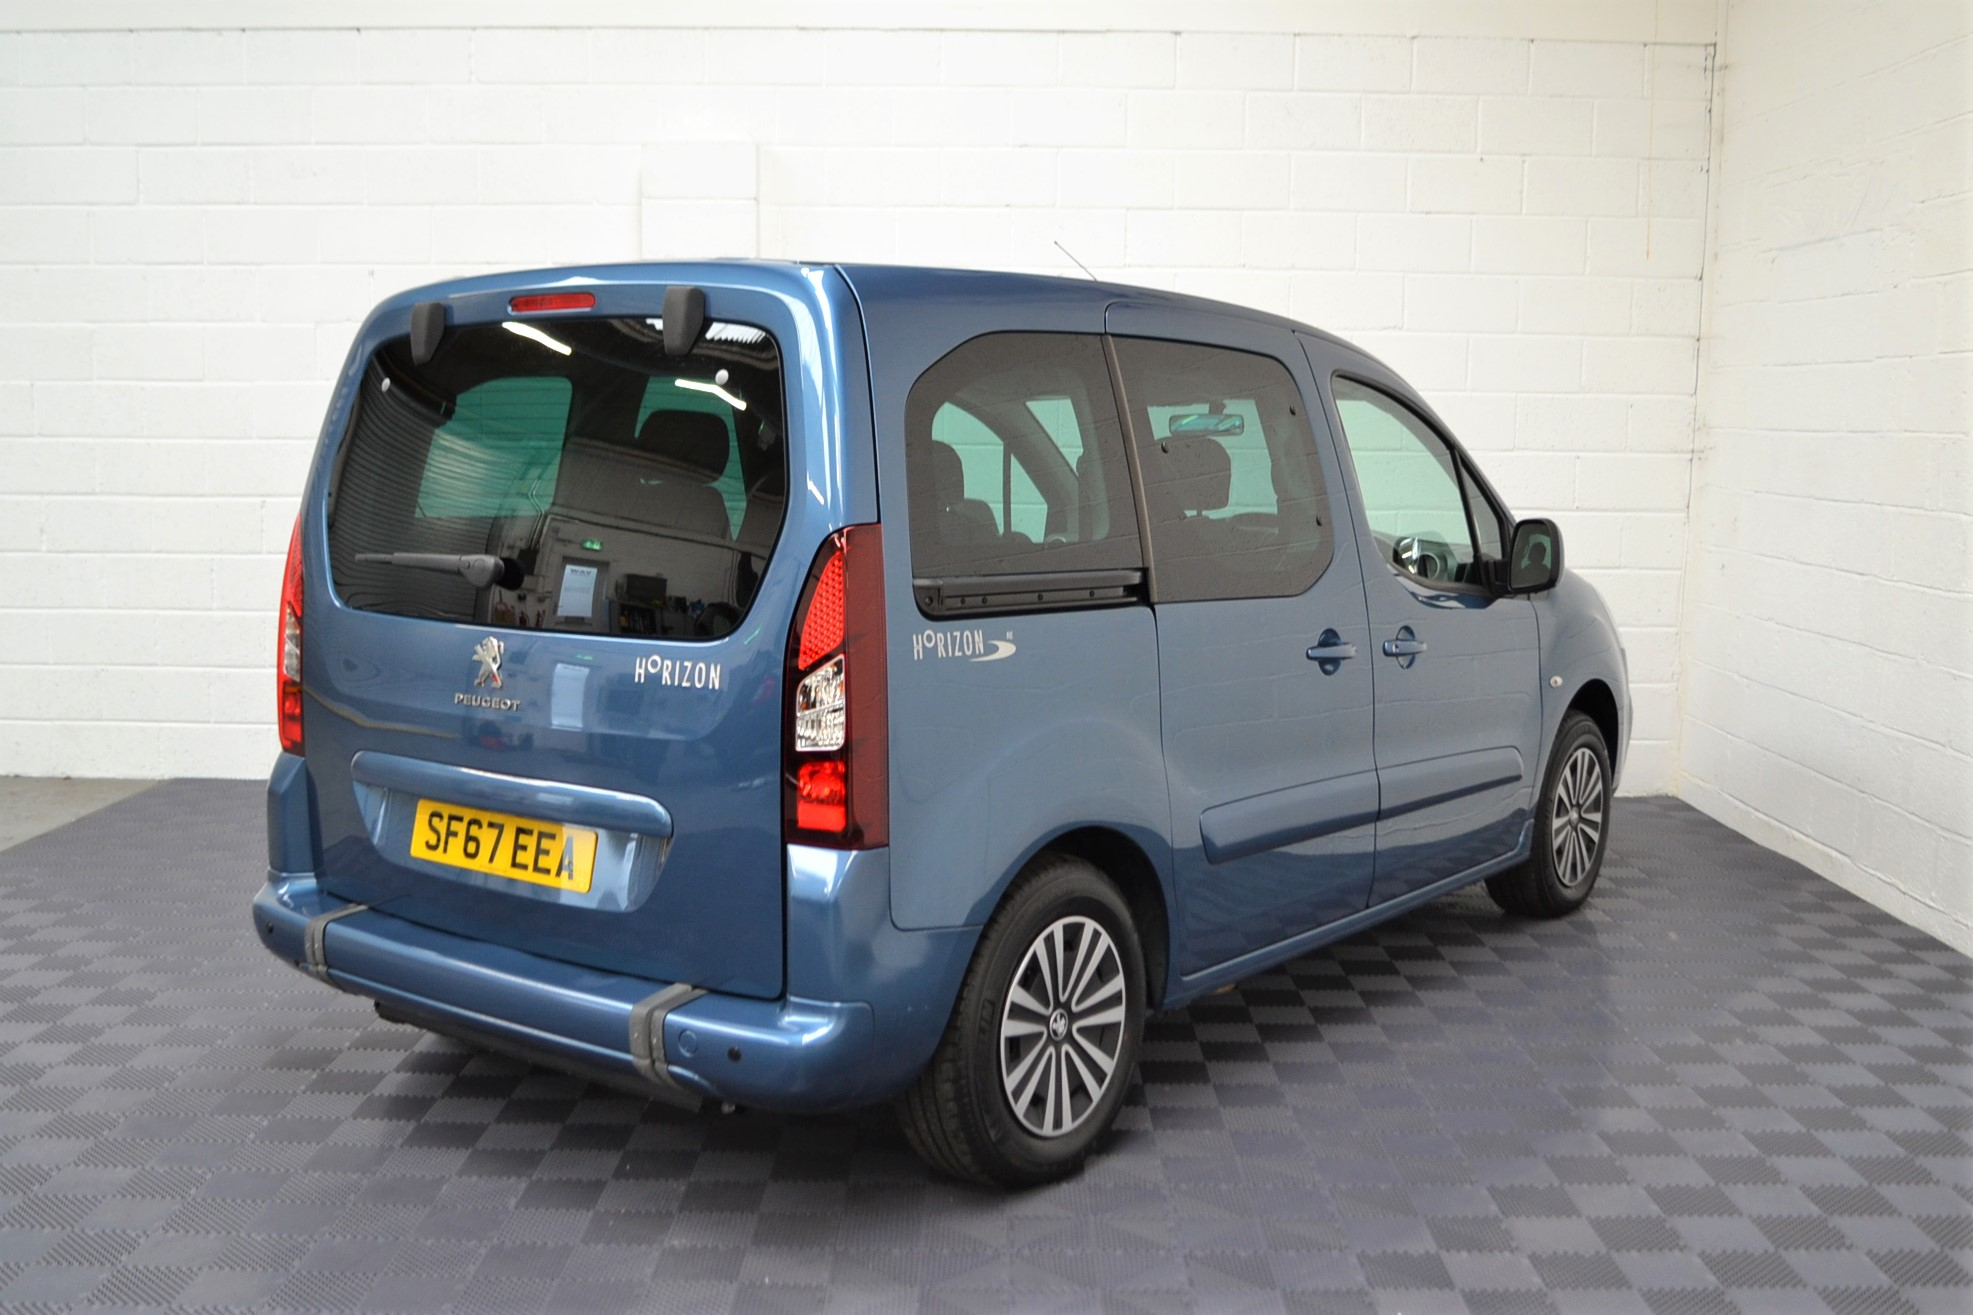 WAV Cars For Sale Bristol Wheelchair Accessible Vehicles Used For Sale Somerset Devon Dorset Bath Peugeot Partner SF67 EEA 12